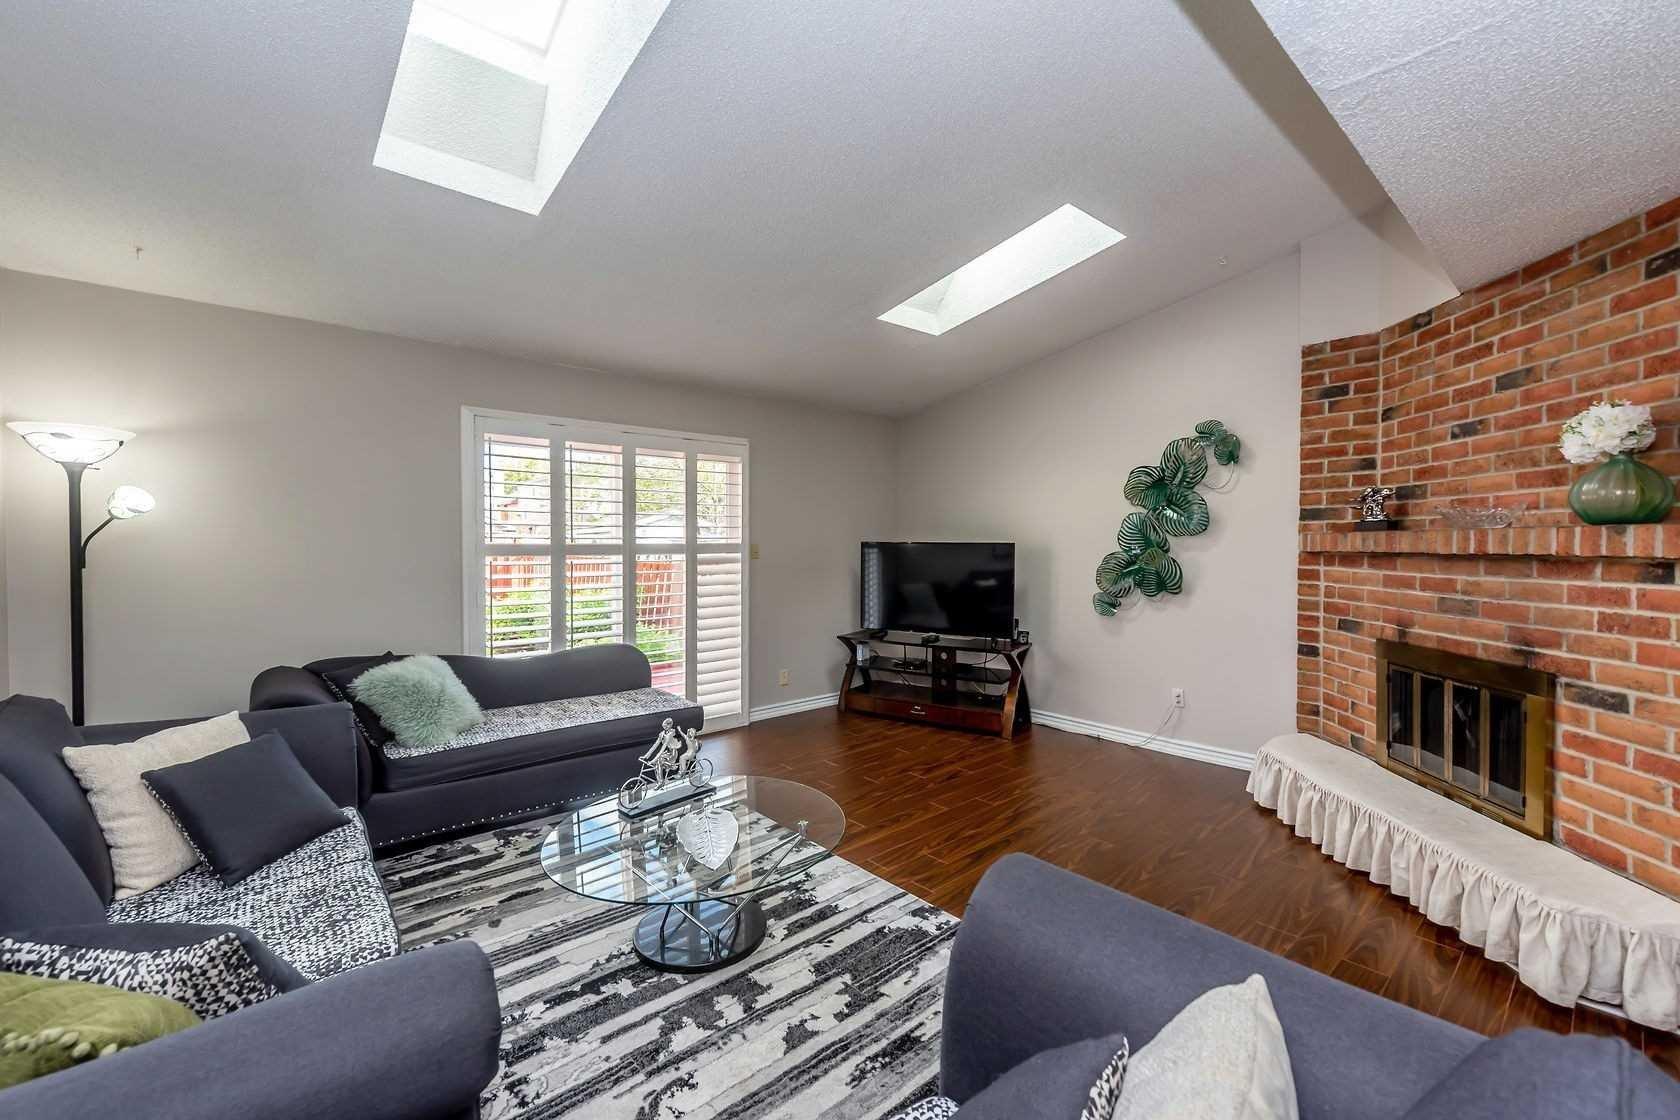 House for sale at 285 Macintosh Dr Hamilton Ontario - MLS: X4970180